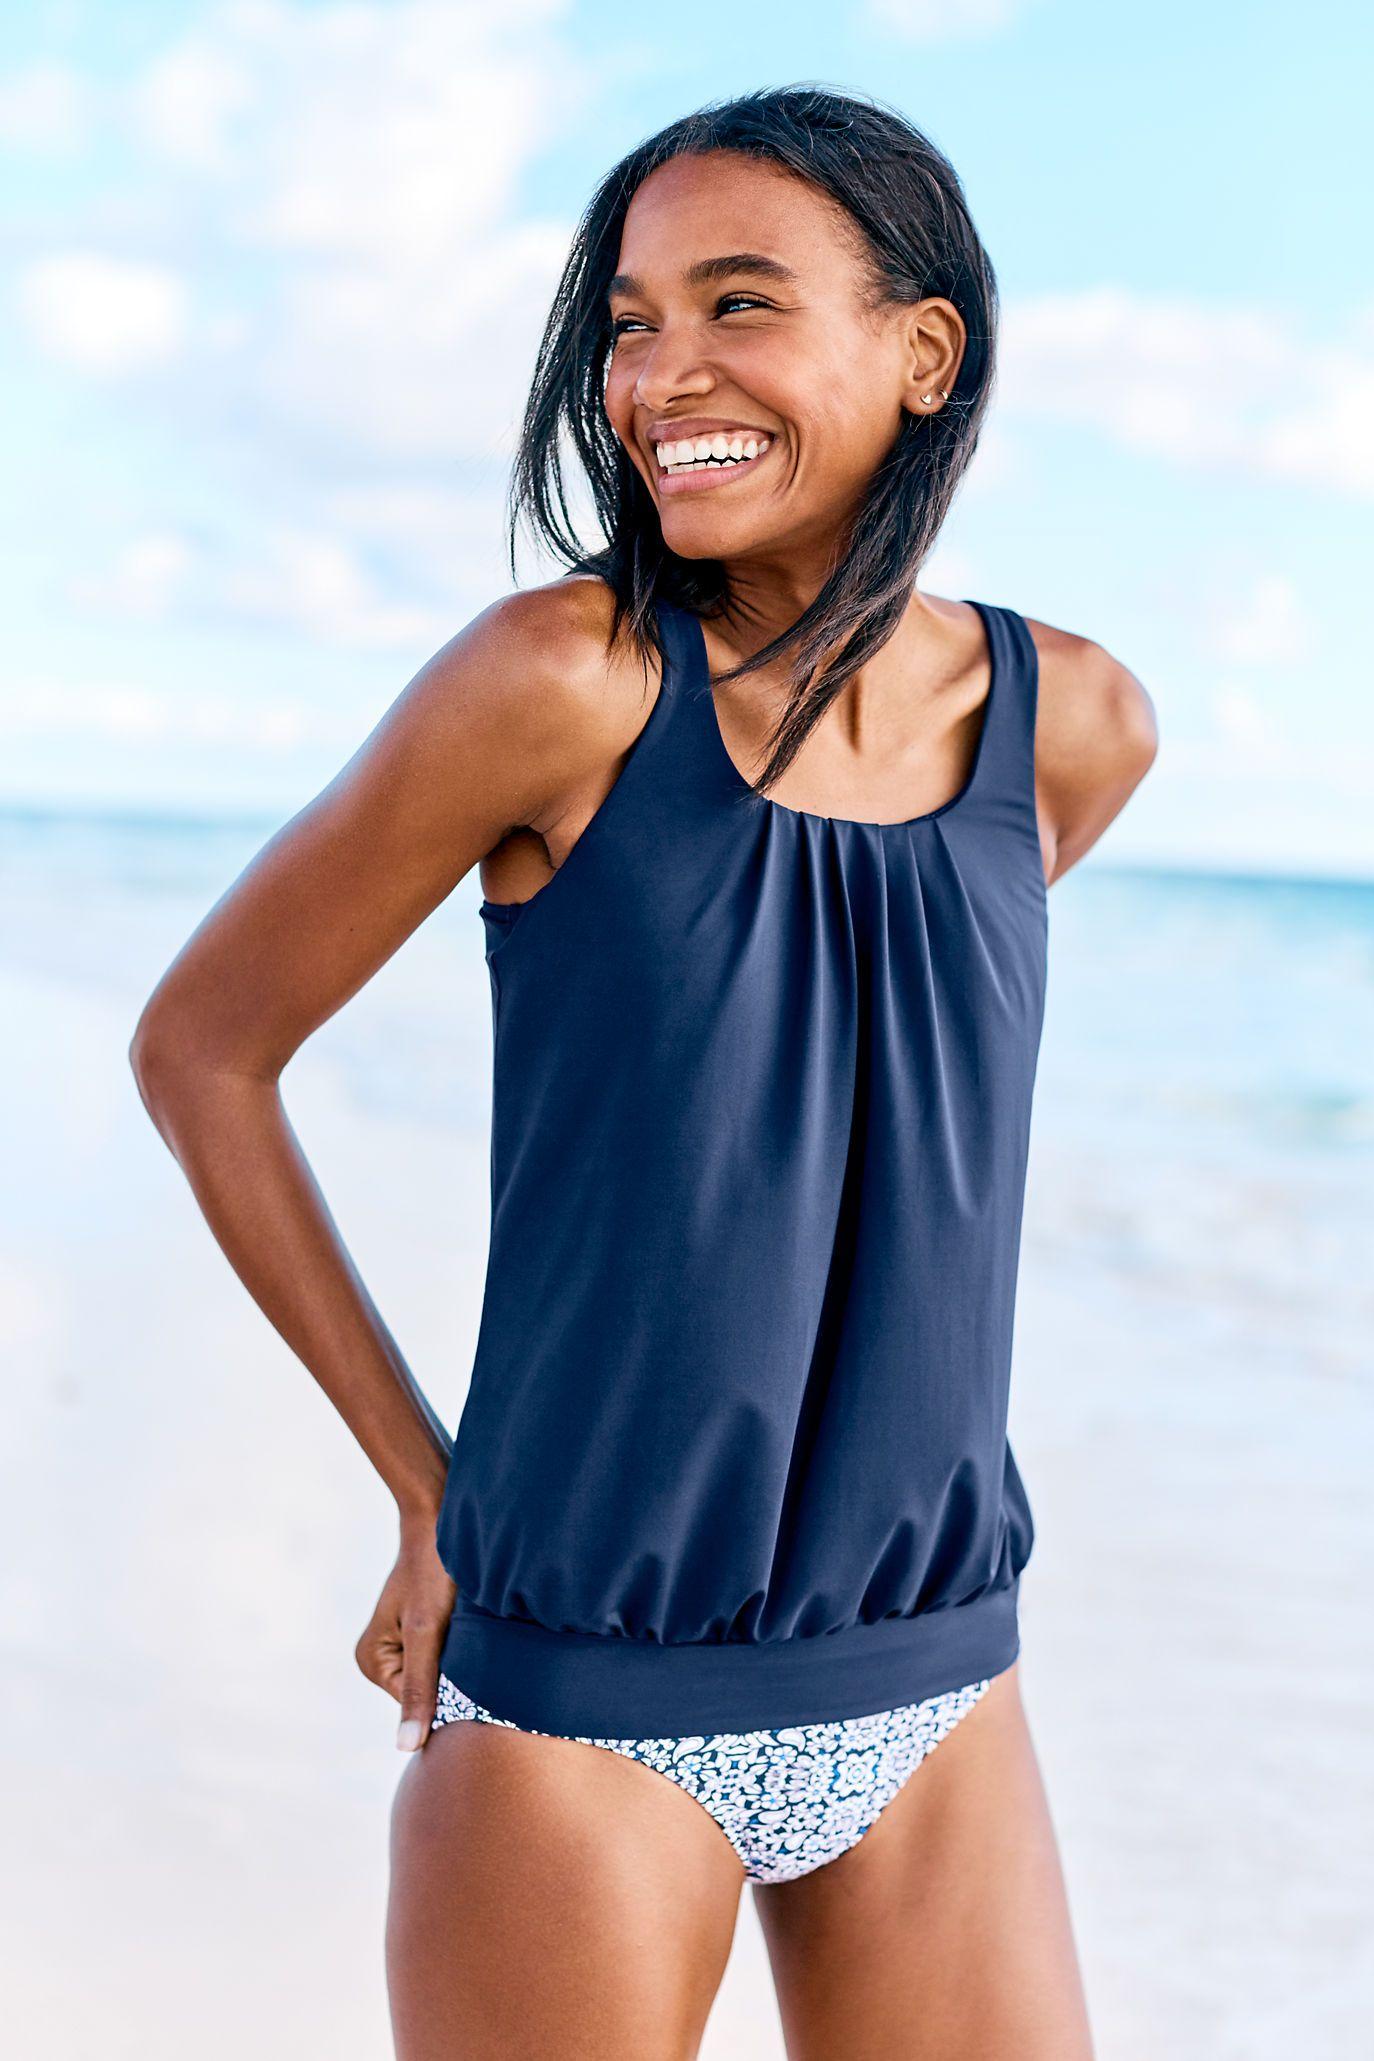 ed561e0b20 Women's Blouson Tankini Top | Swim suits | Tankini, Swimsuits, Swimwear